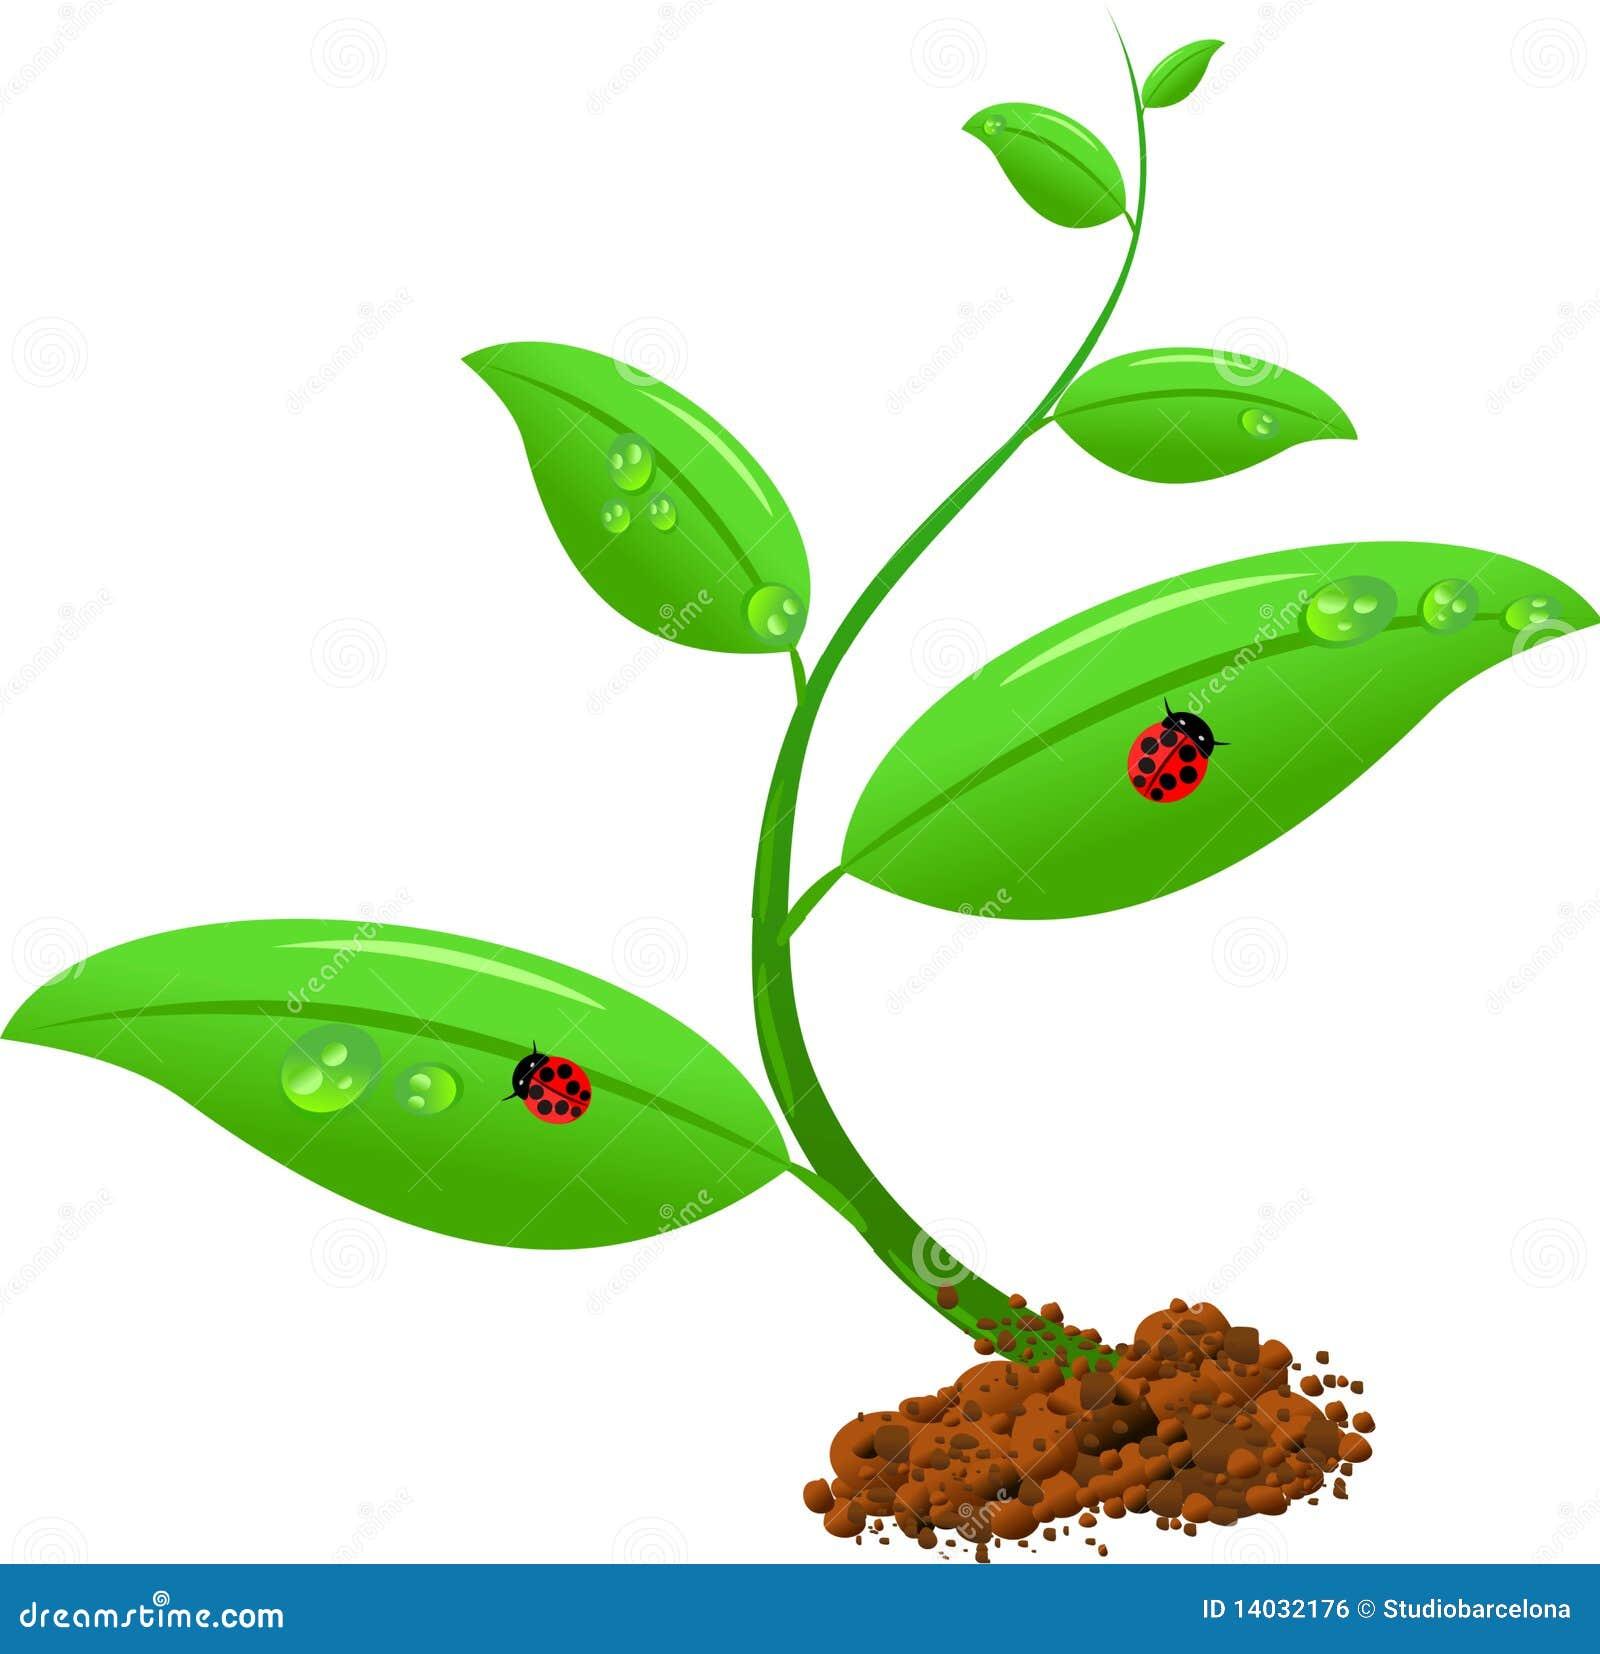 Newborn Plant Royalty Free Stock Image - Image: 14032176